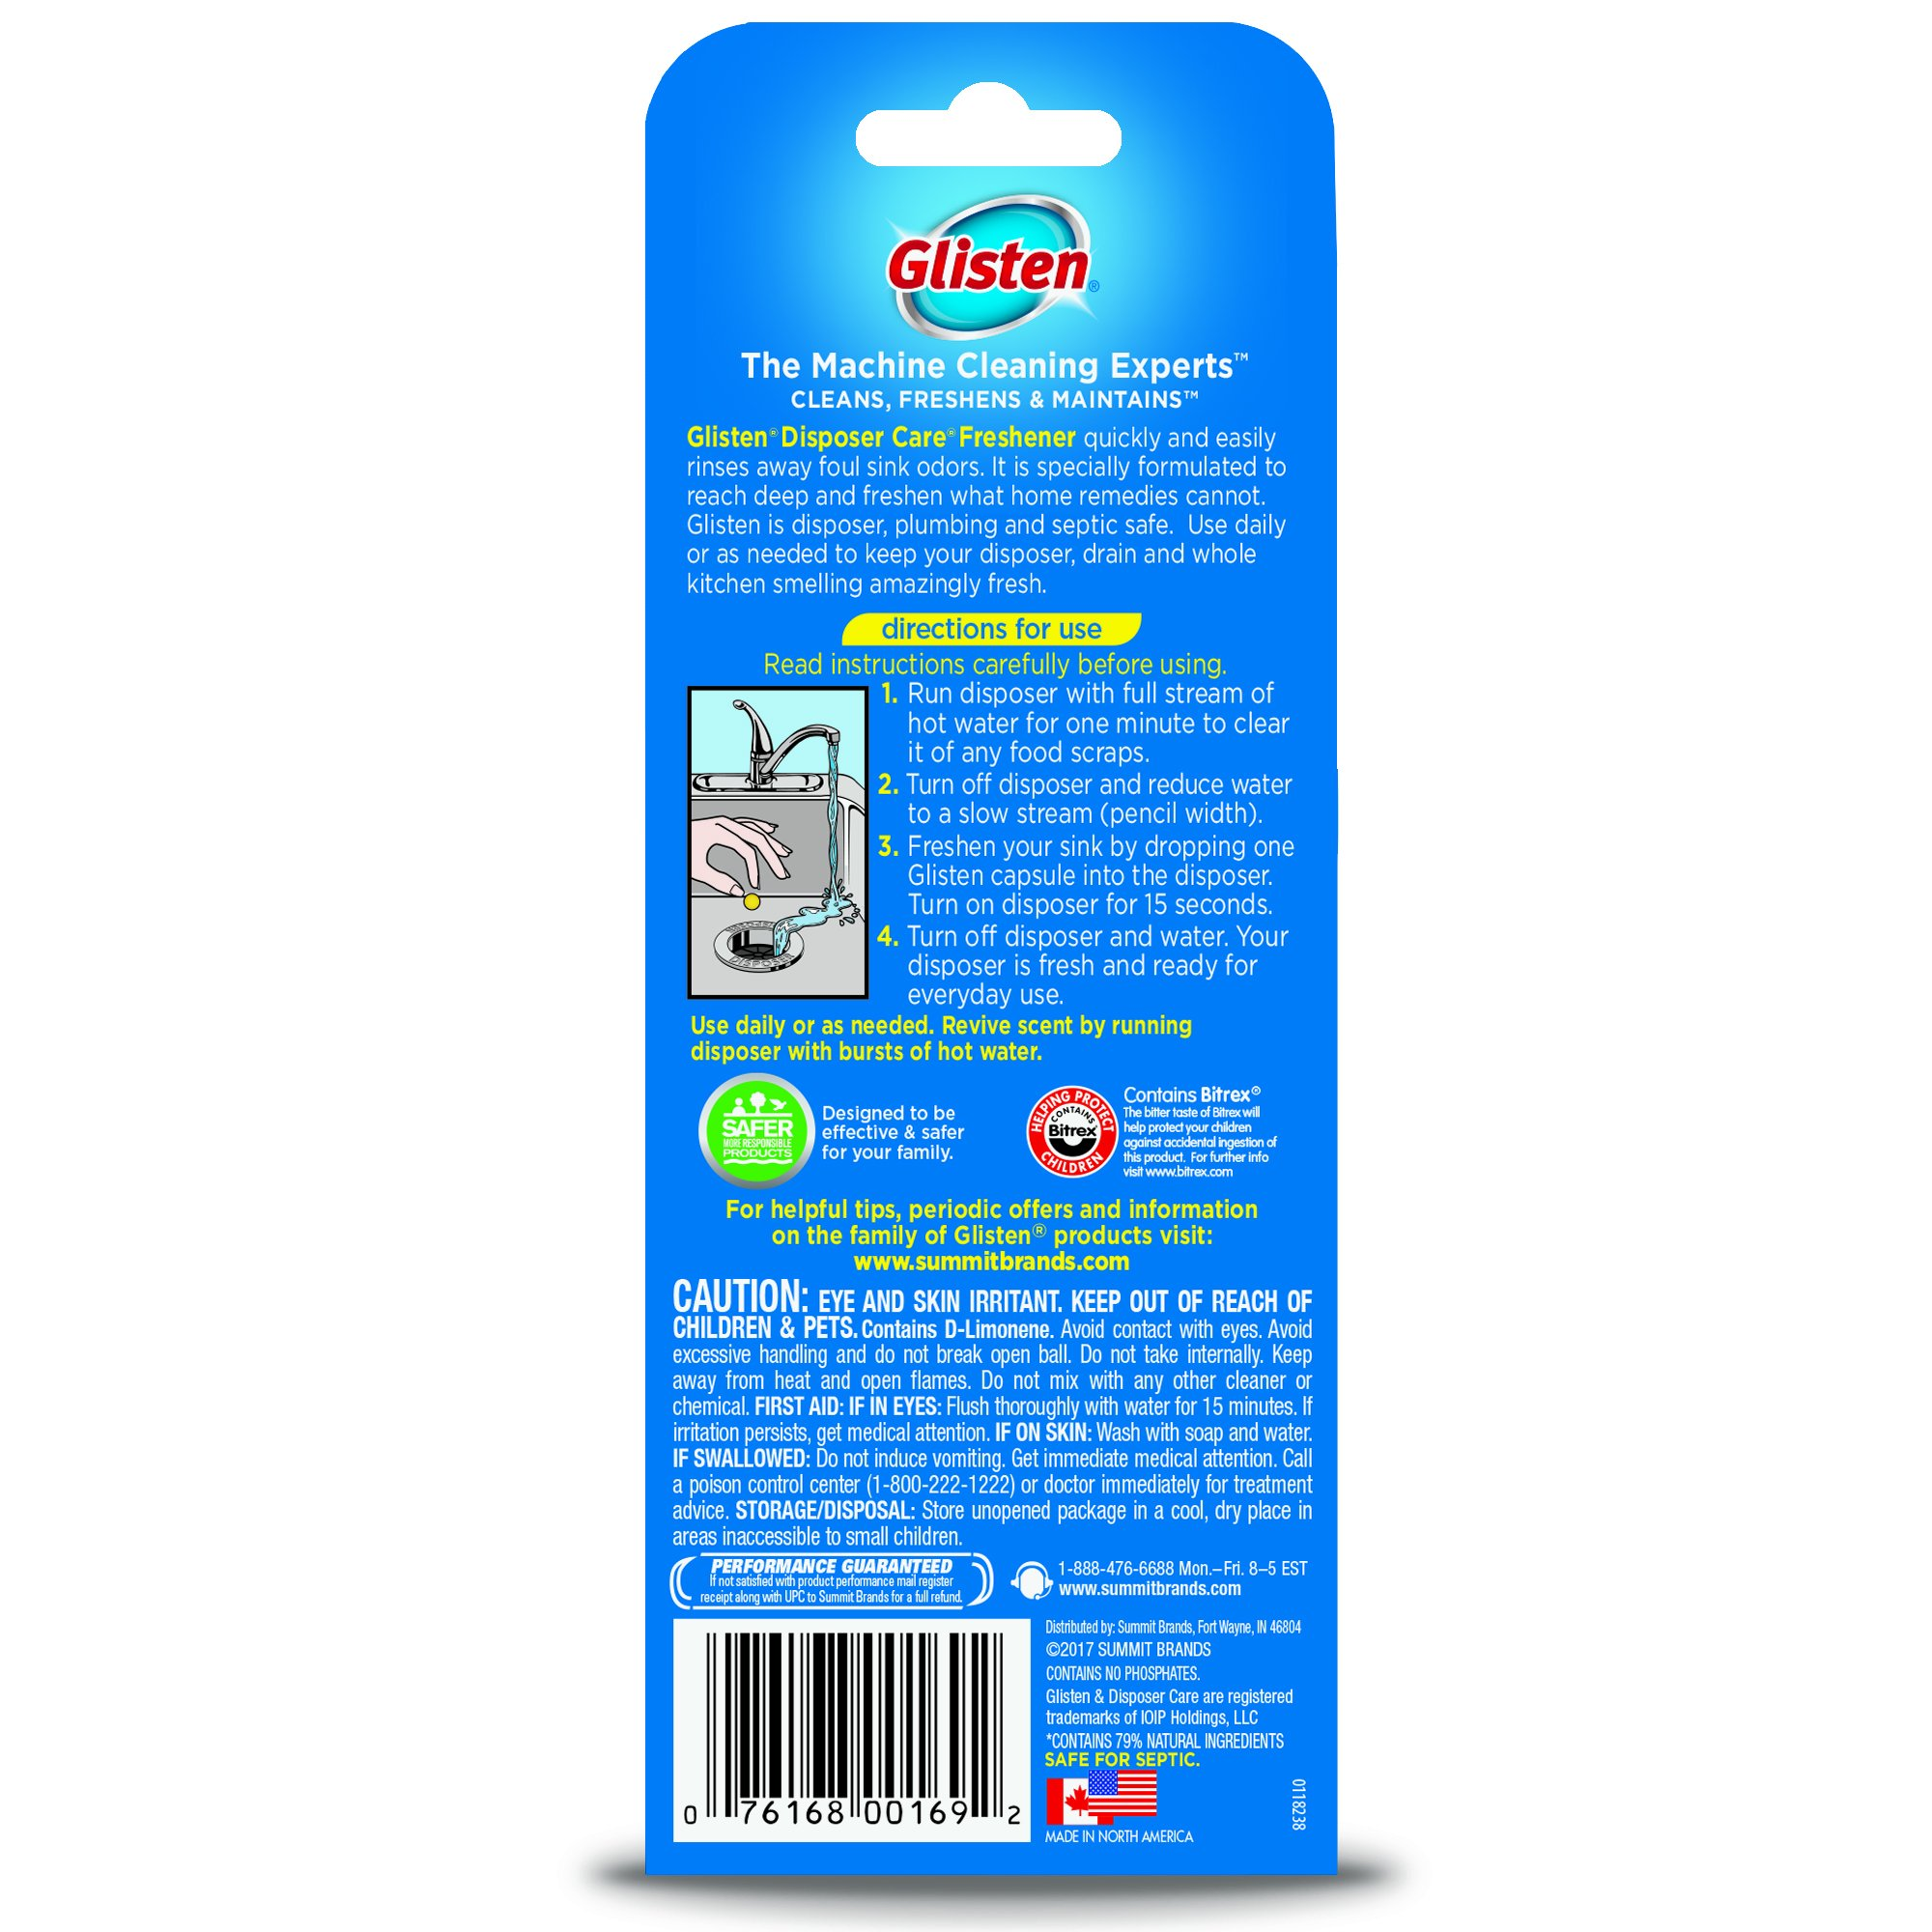 Glisten Disposer Care Freshener, Lemon Scent, 12 Pack, 120 Use by Glisten (Image #2)